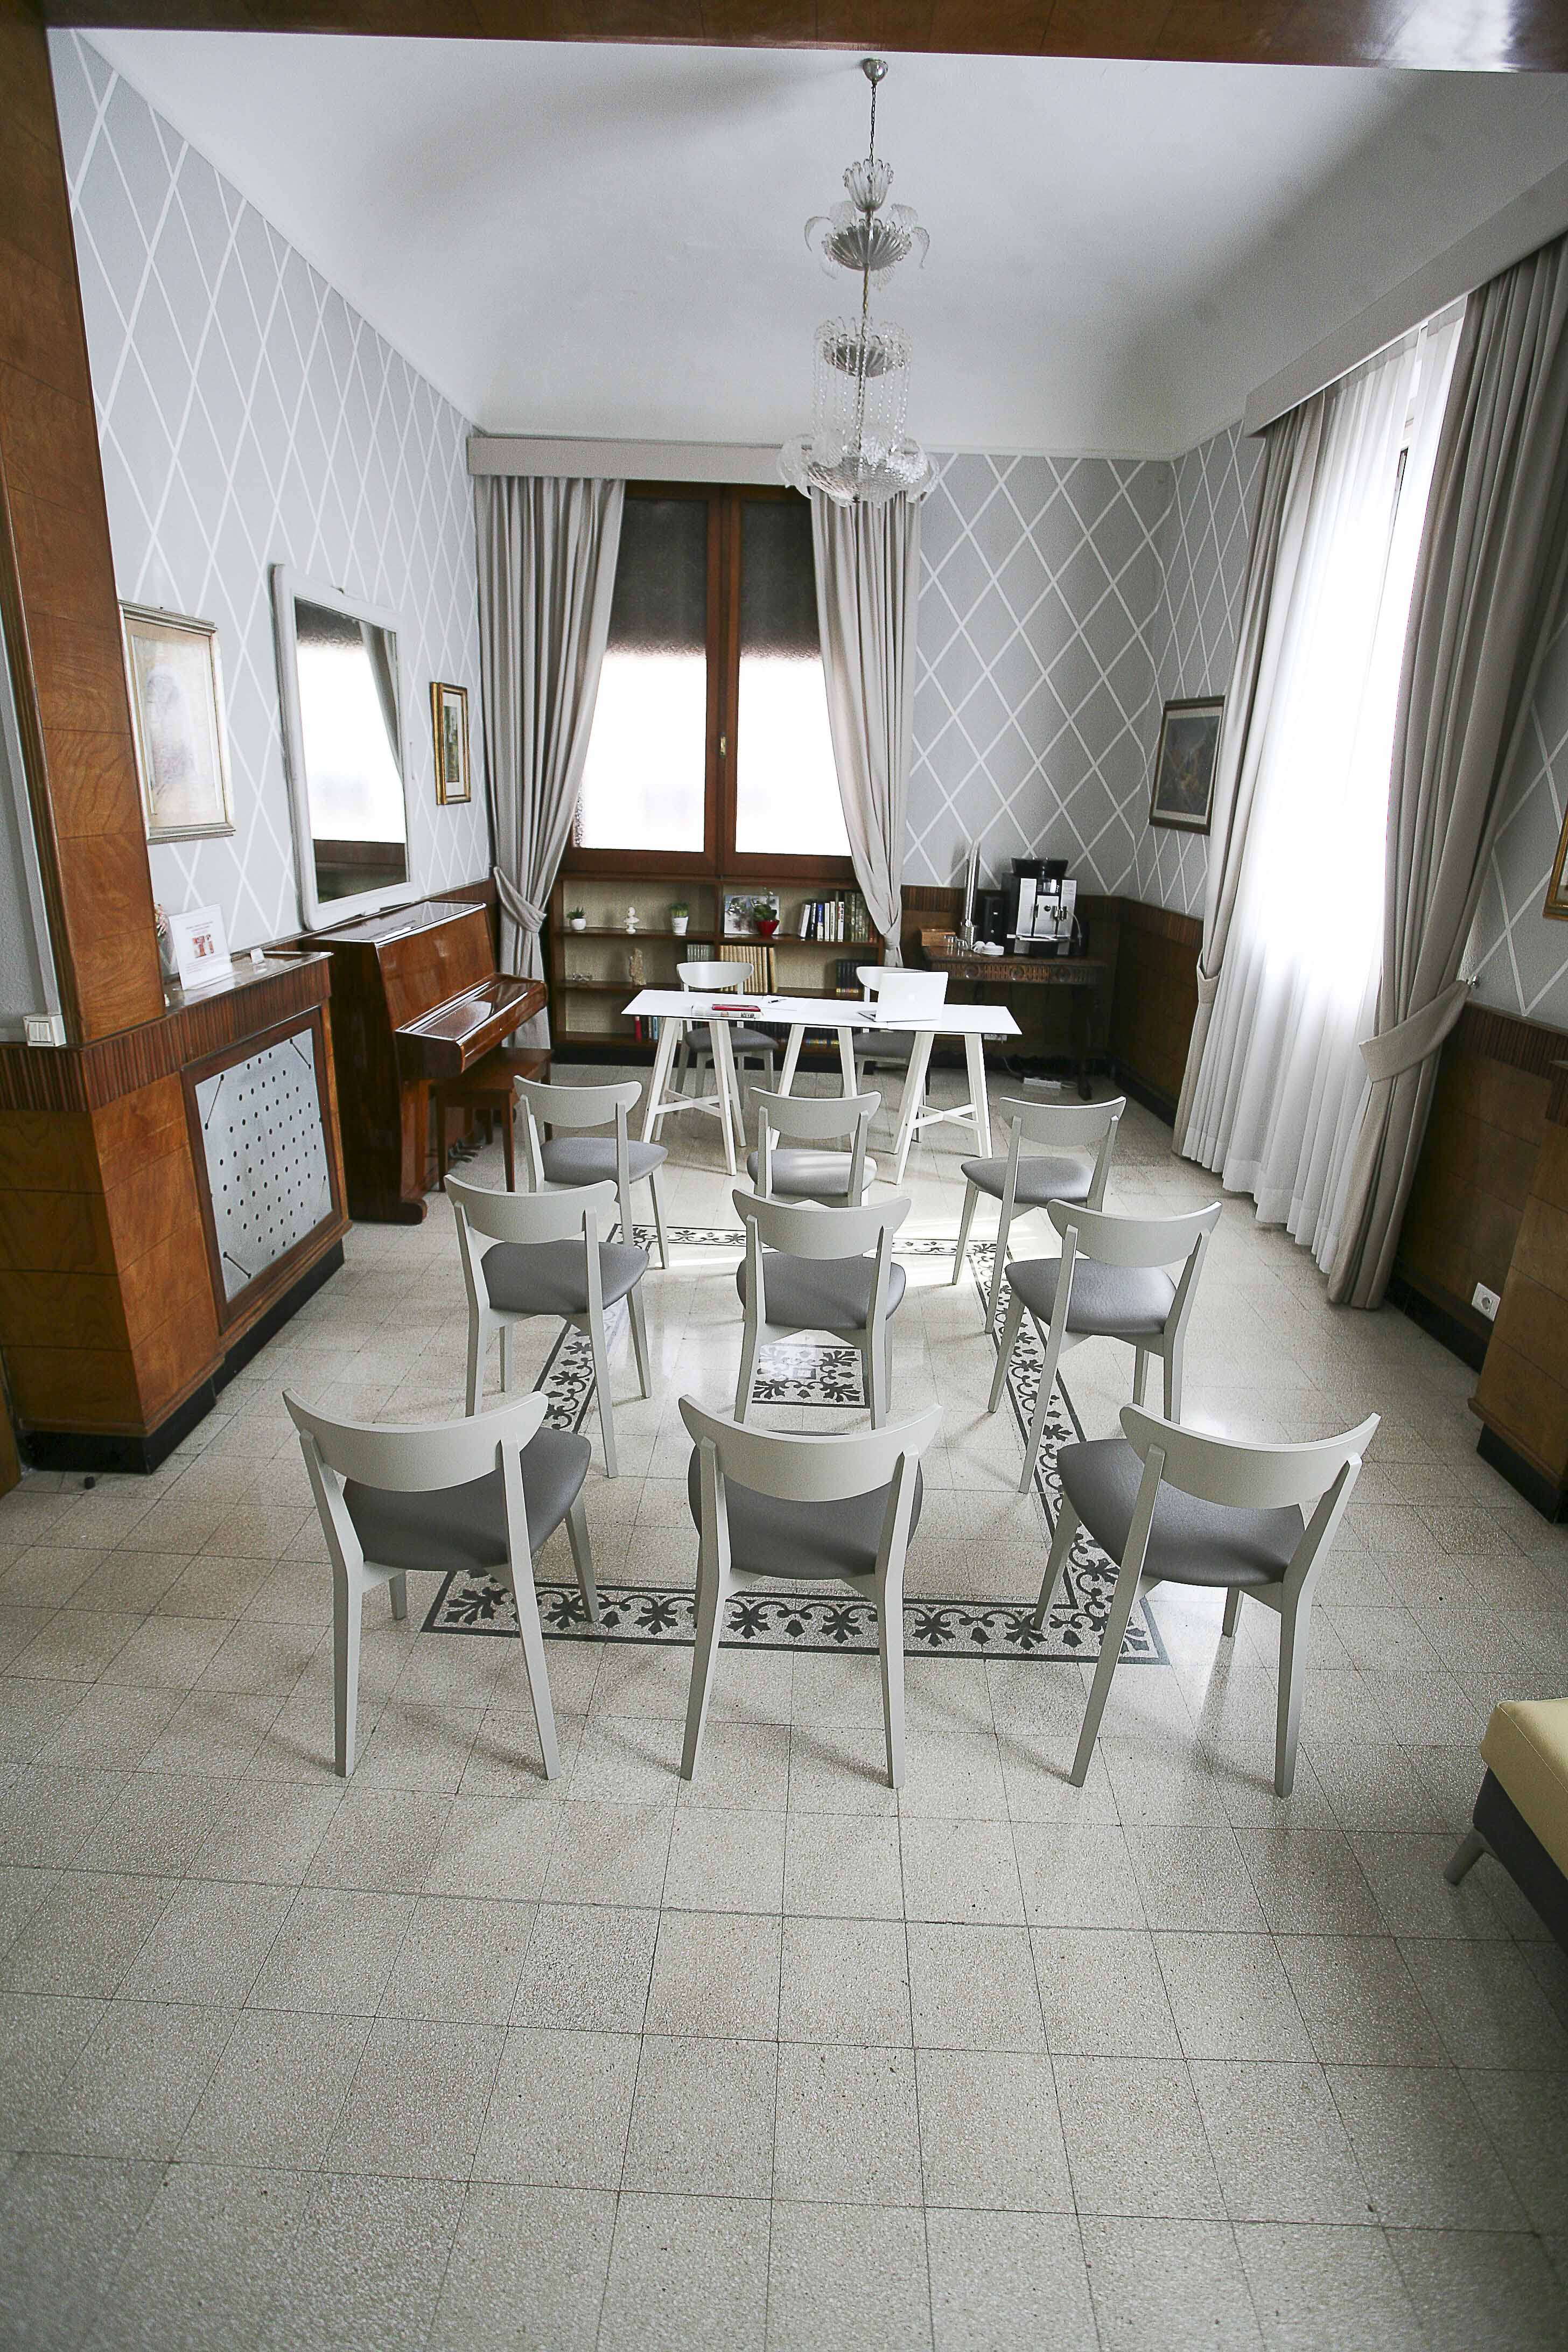 Sala piccole riunioni 1.0